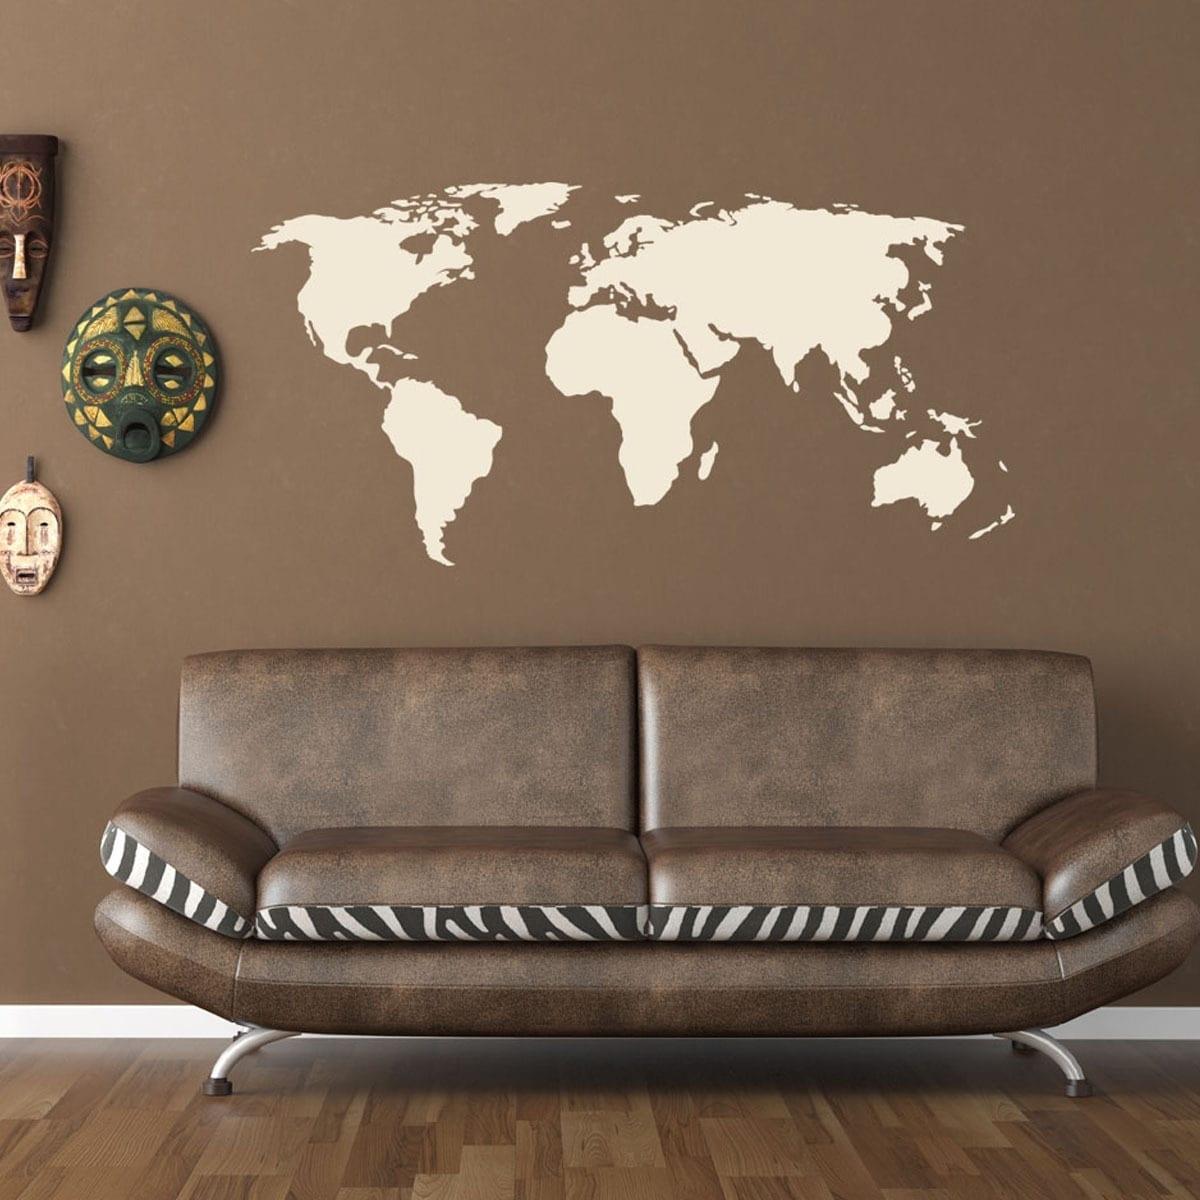 Shop World Map World Vinyl Wall Art – Free Shipping Today With Regard To Vinyl Wall Art World Map (View 20 of 20)